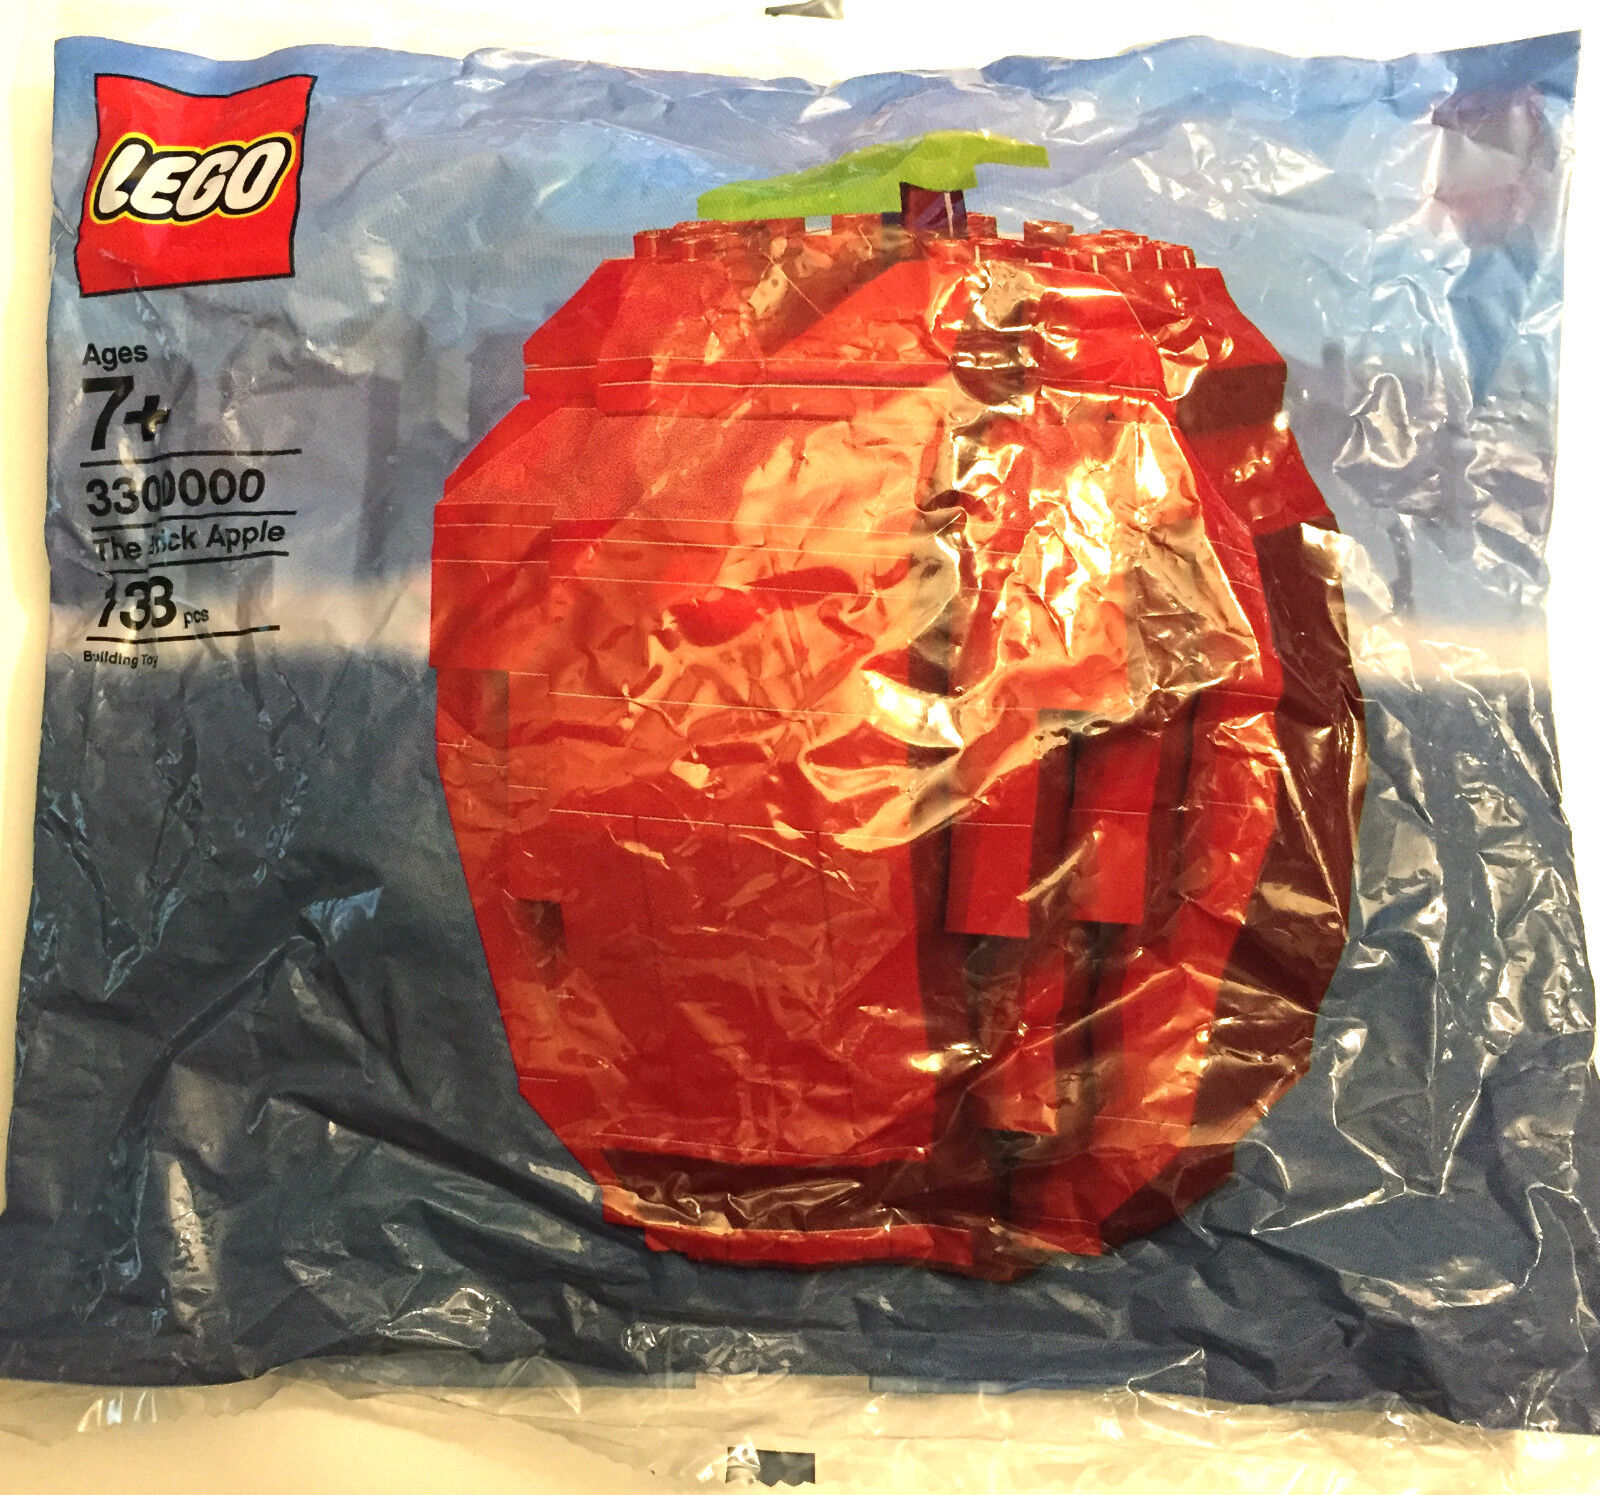 *NEW* Lego THE BRICK APPLE Polybag 3300000